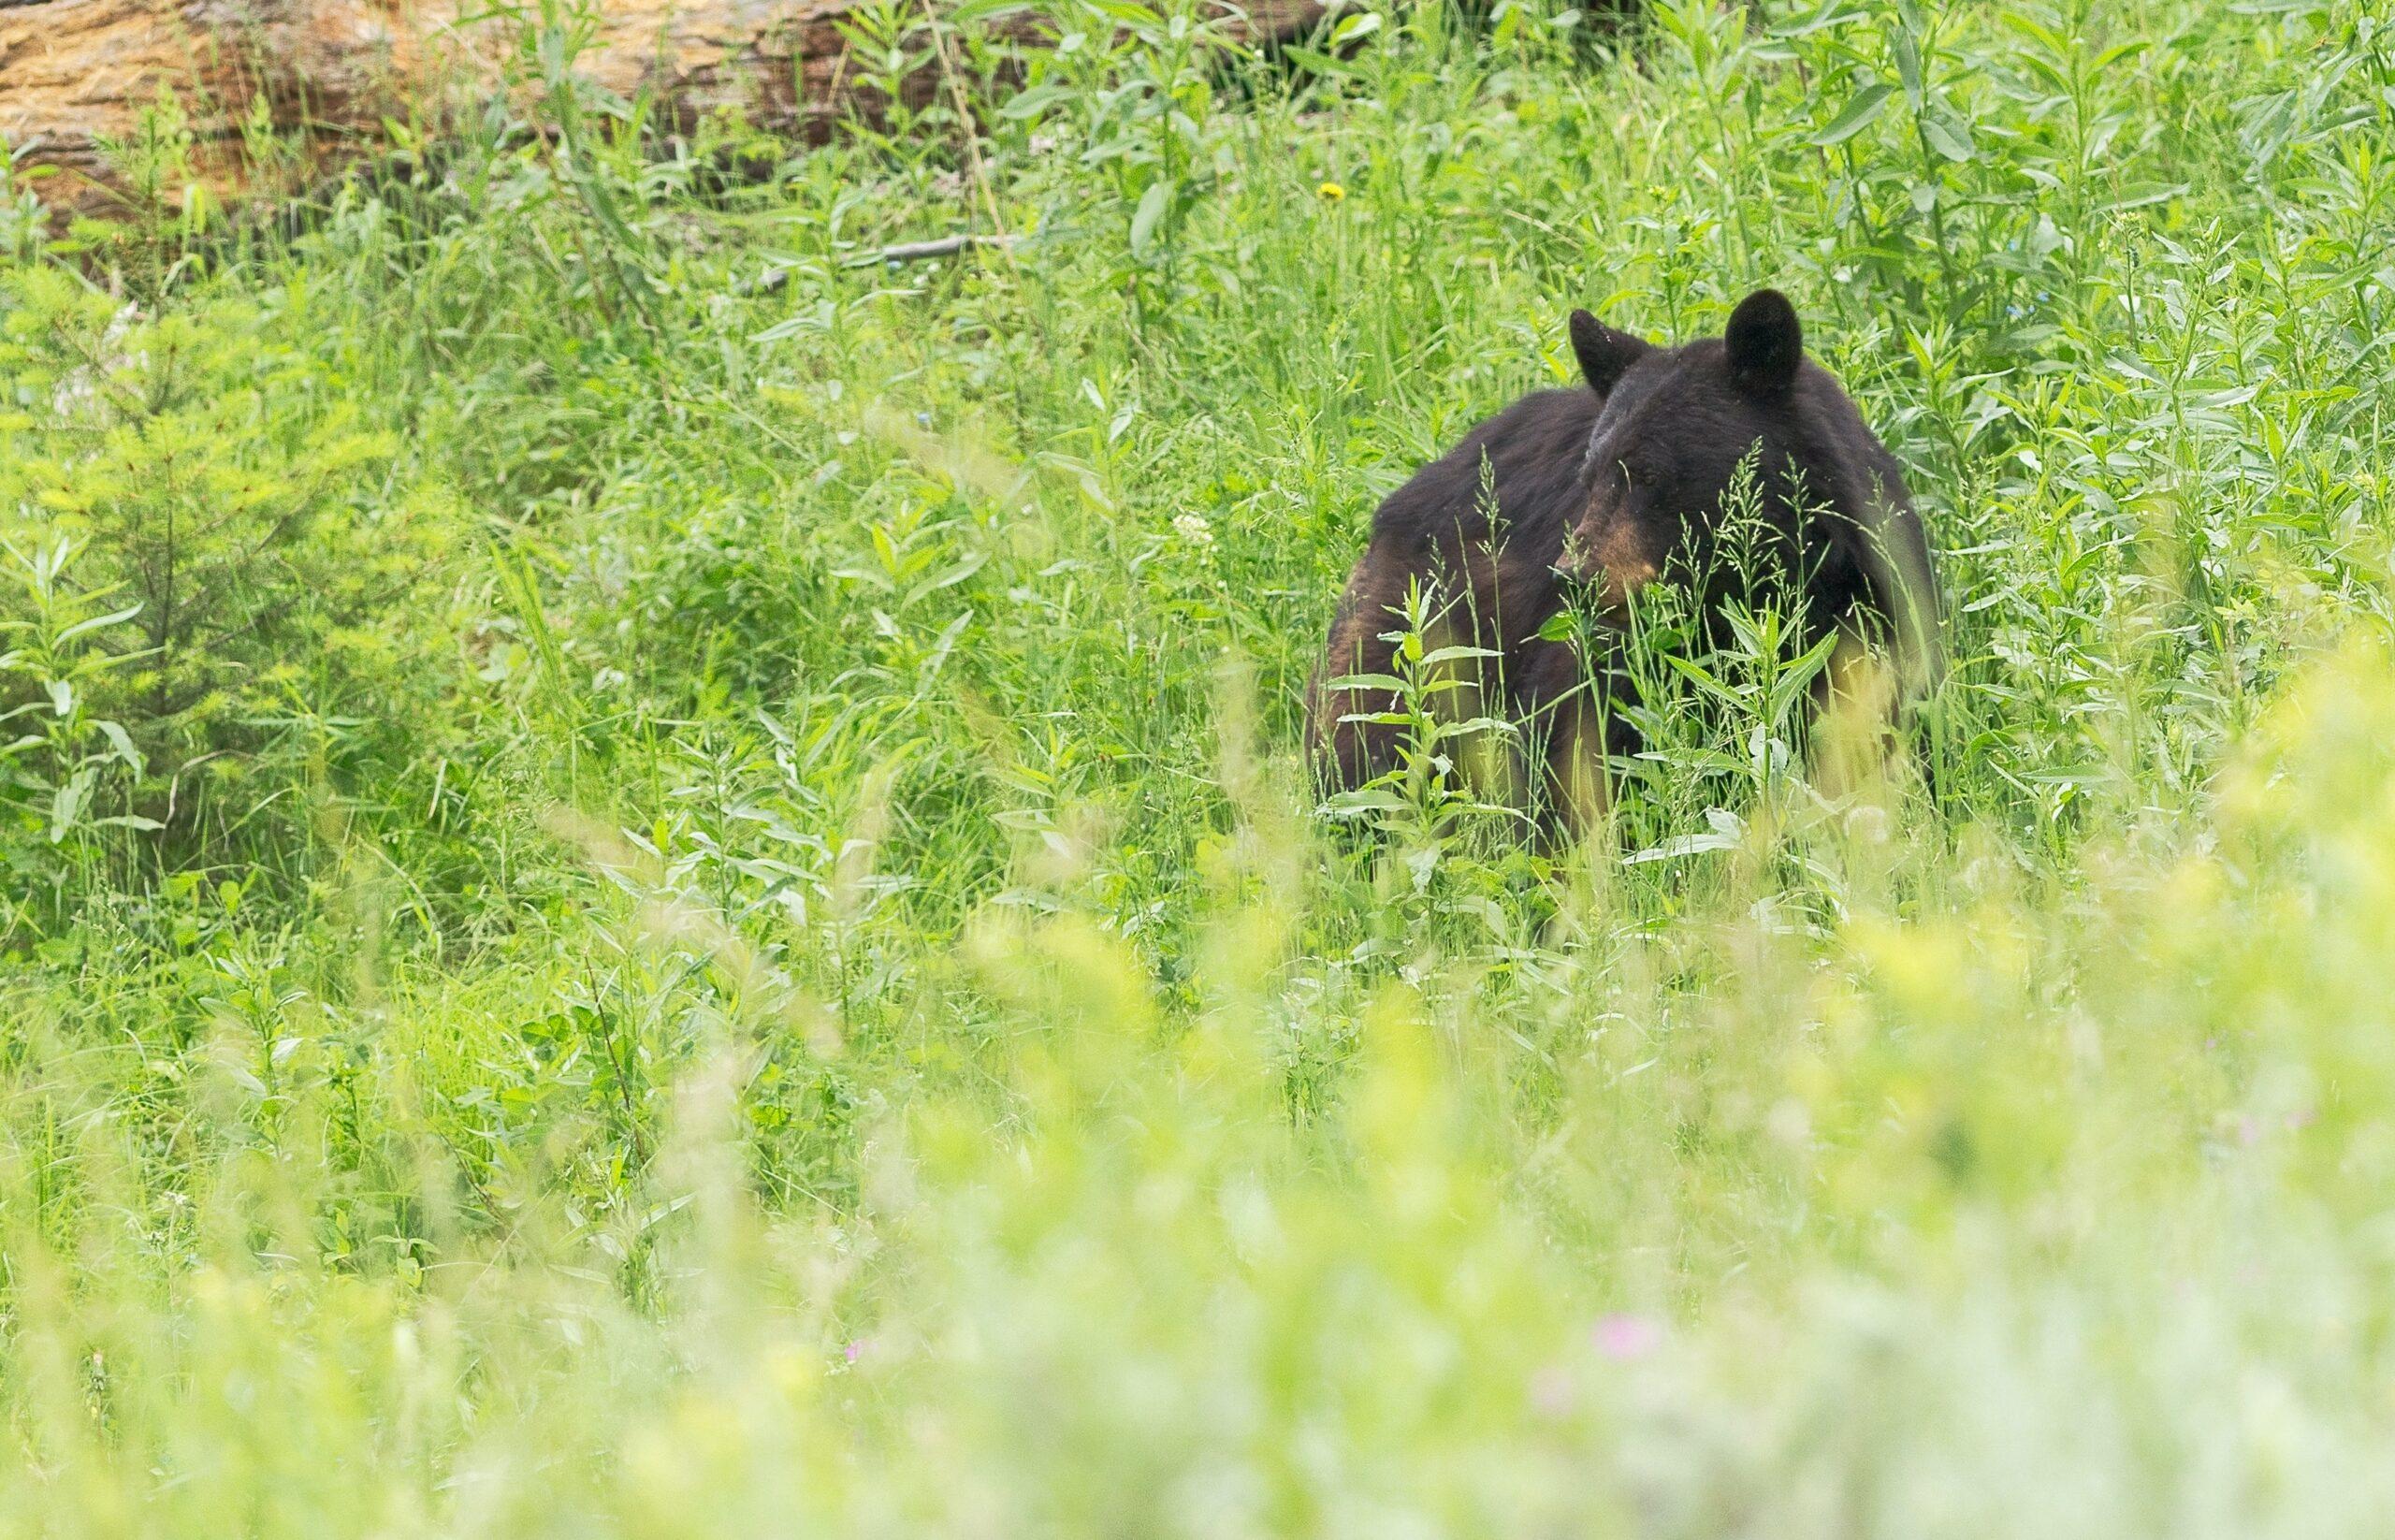 brown sun bear on green field during daytime